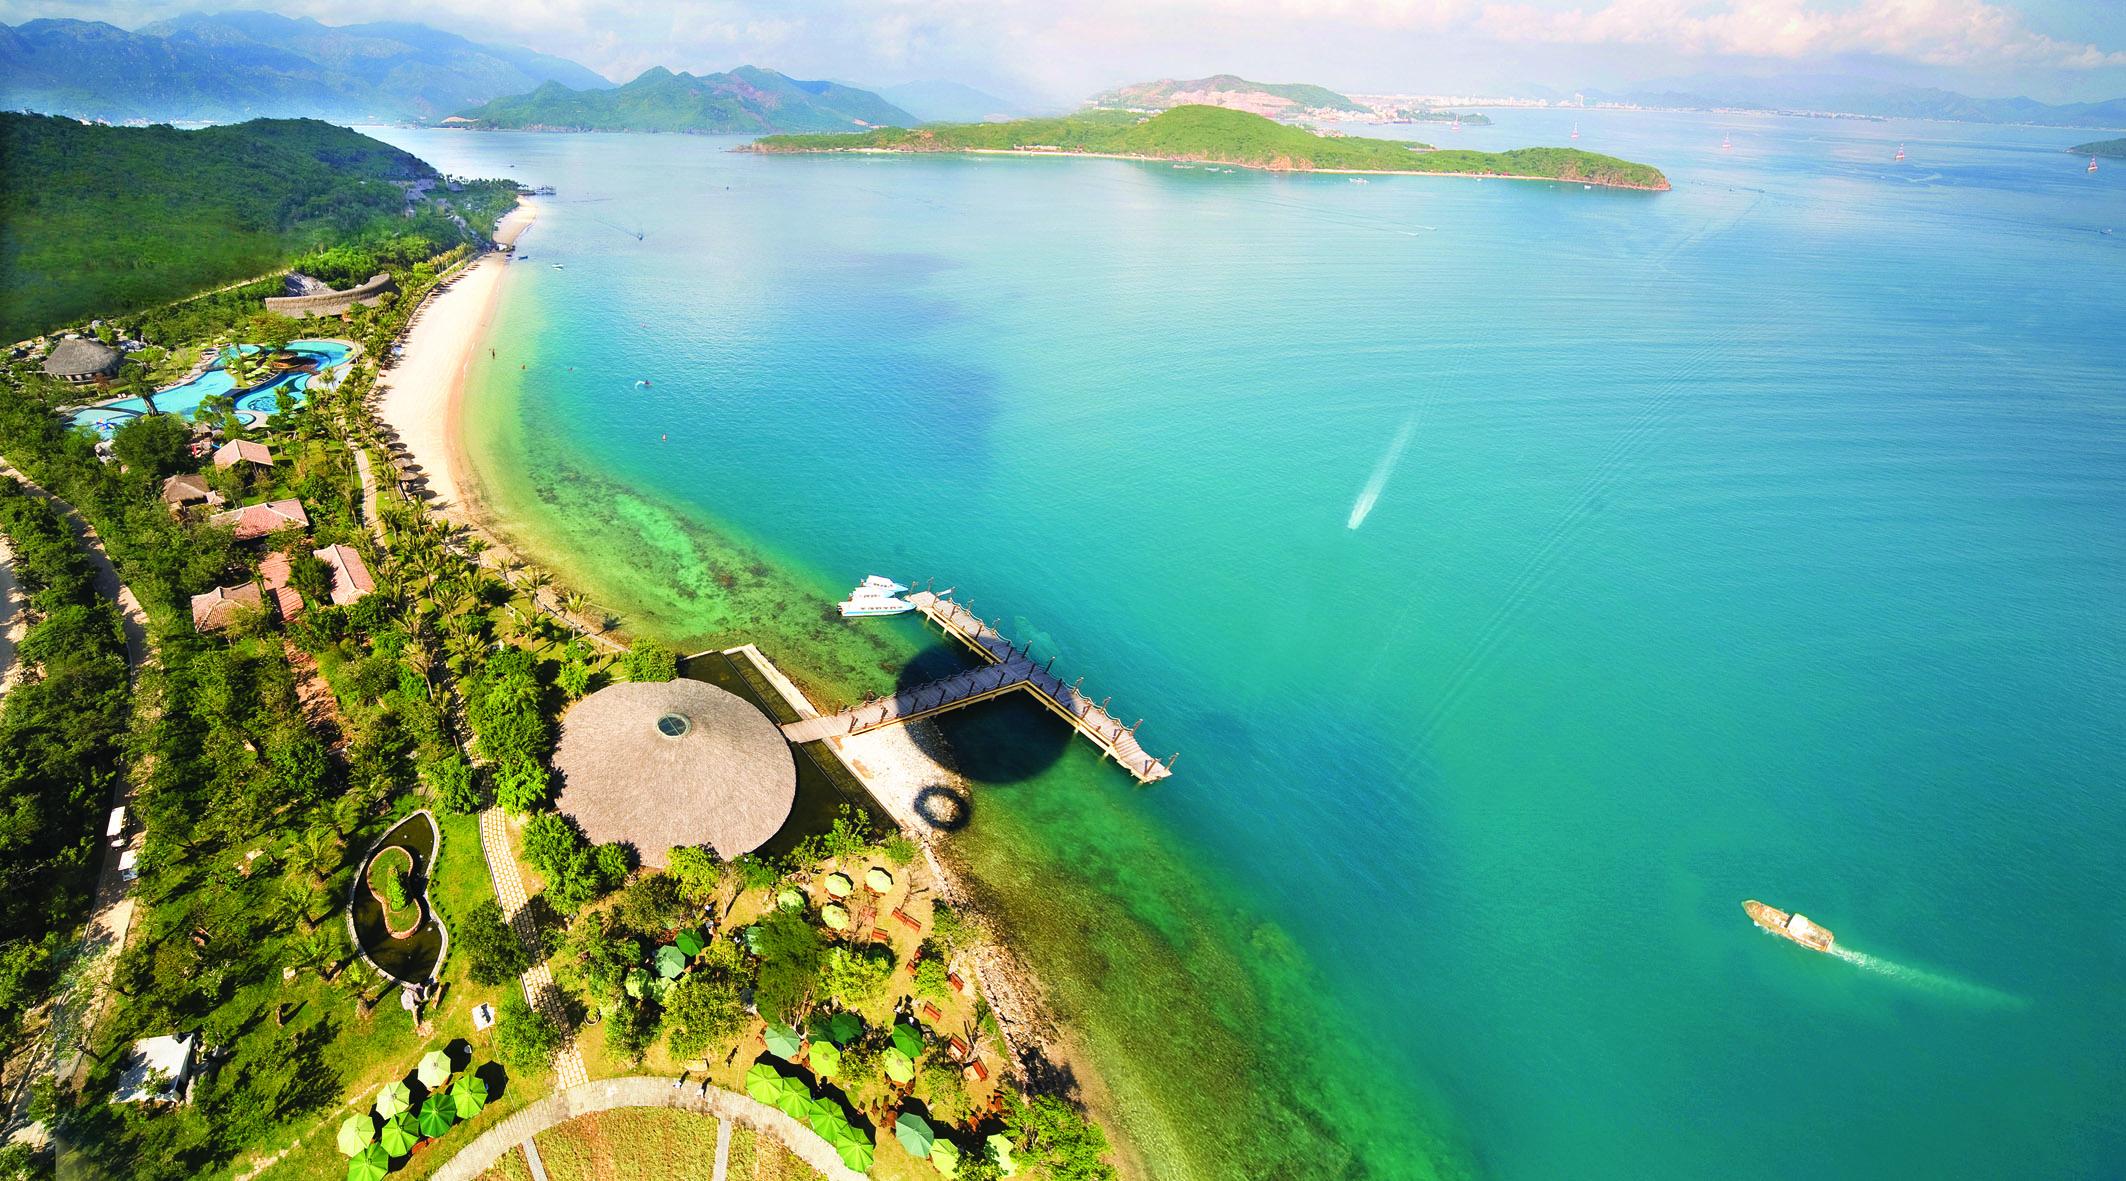 Wonderful view of Nha Trang Beach